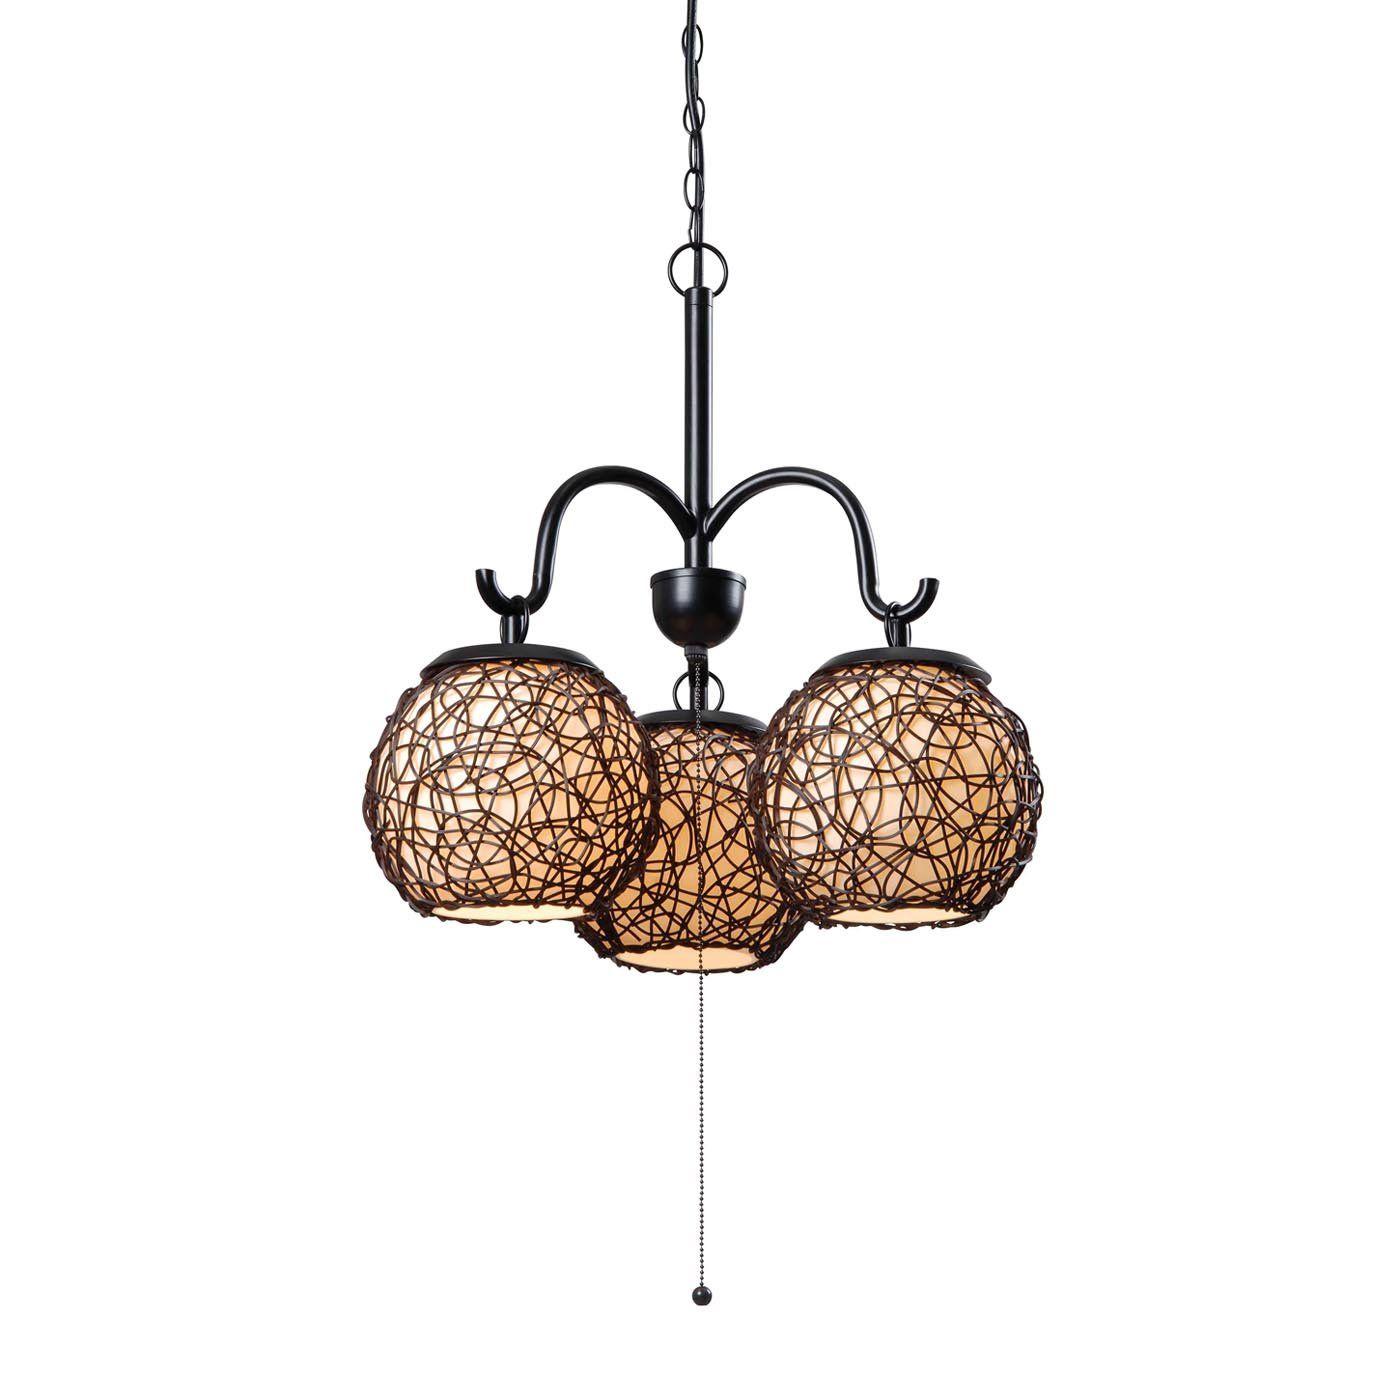 Shop kenroy home 93403brz castillo 3 light mini chandelier at atg shop kenroy home 93403brz castillo 3 light mini chandelier at atg stores browse our chandeliers arubaitofo Images